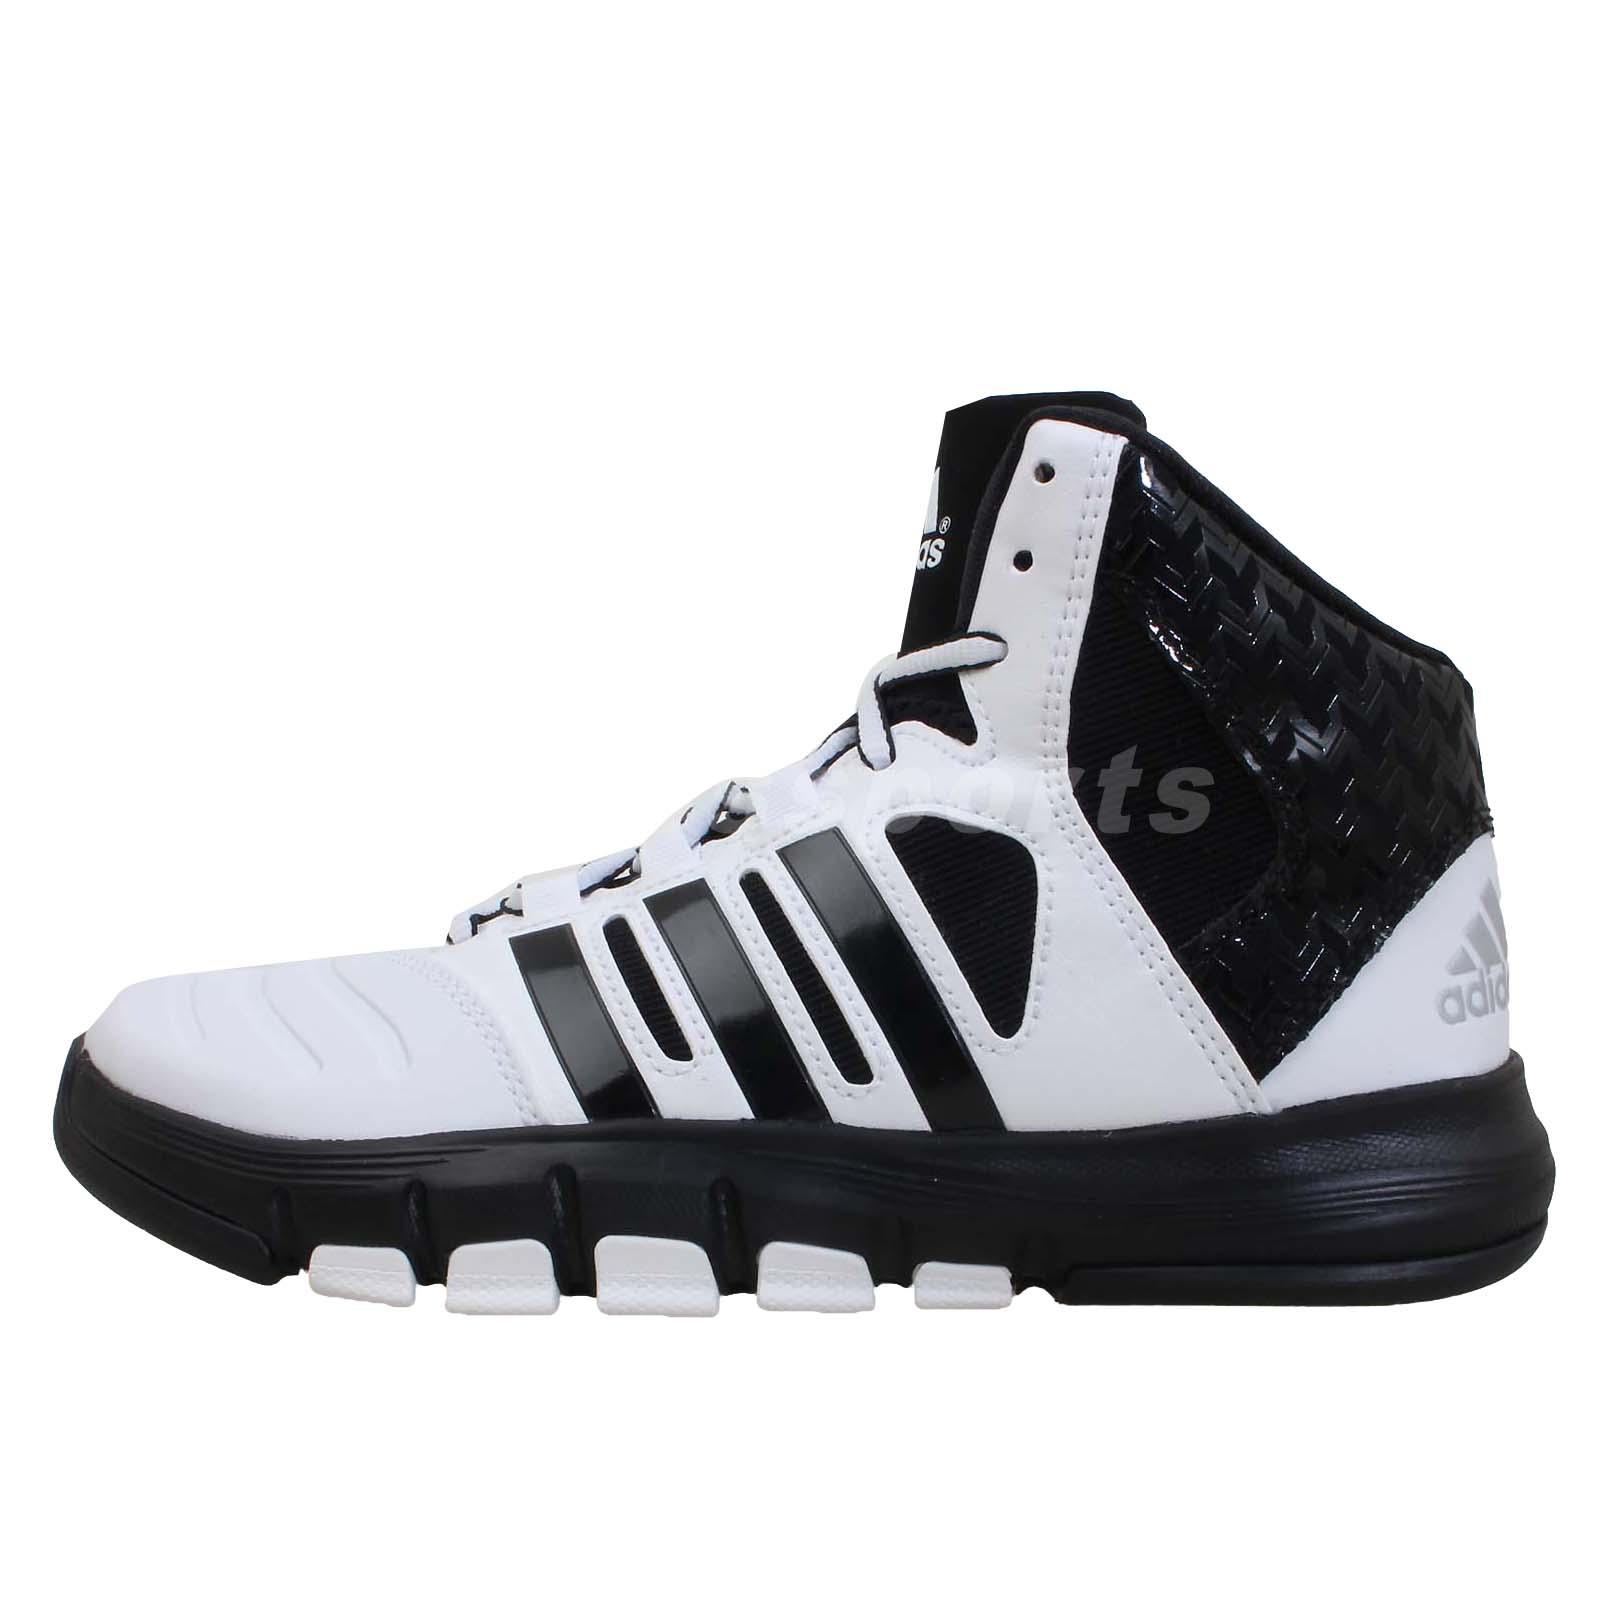 2013 adidas basketball shoes 28 images adidas